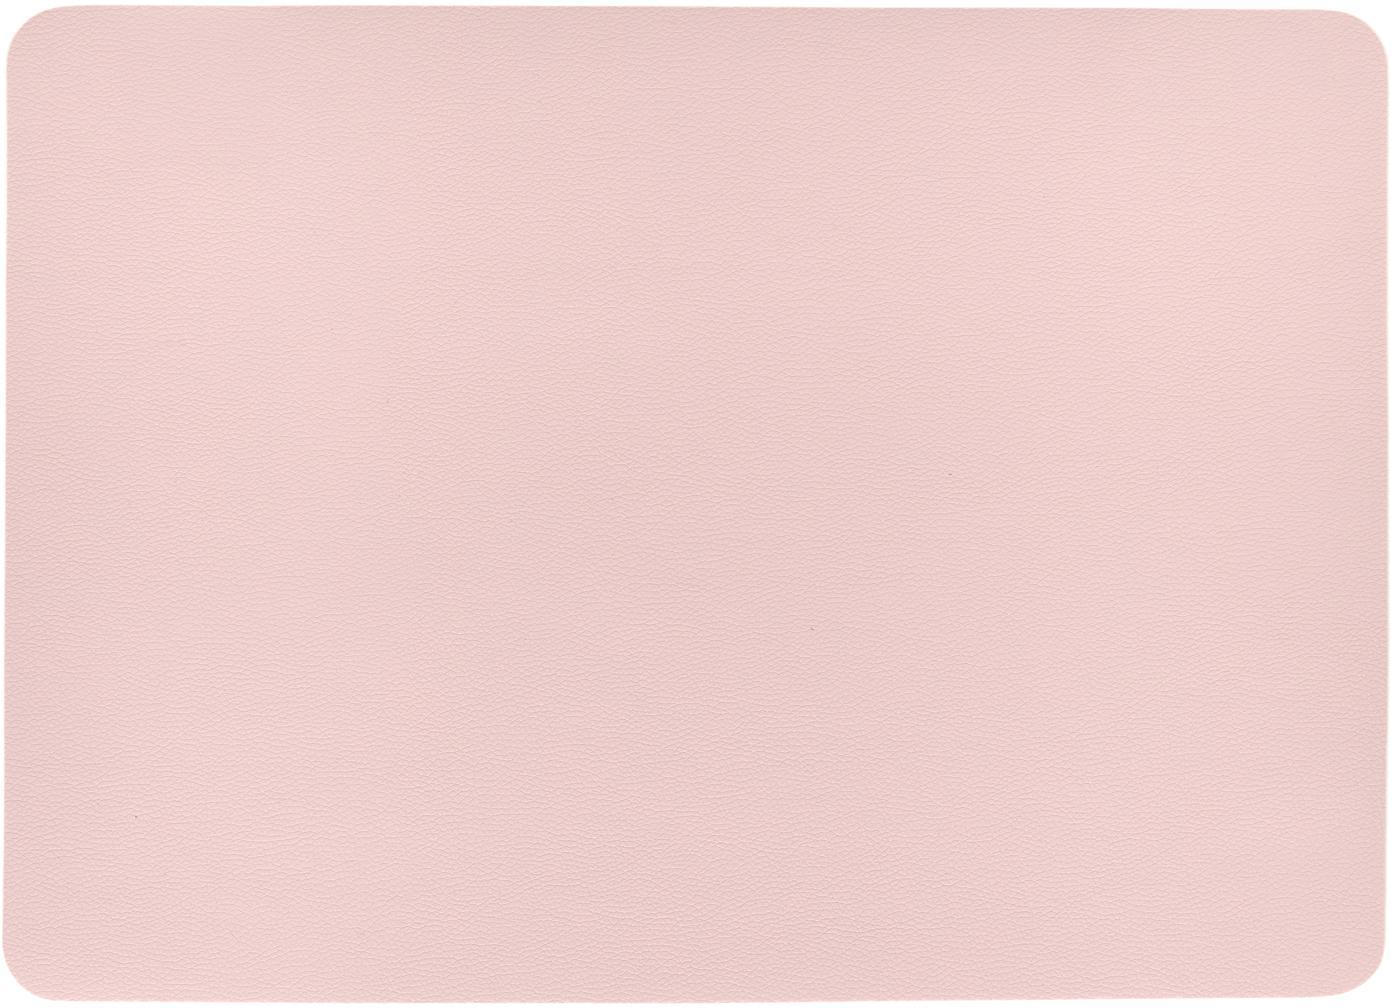 Tovaglietta americana in similpelle Pik 2 pz, Materiale sintetico (PVC), Rosa, Larg. 33 x Lung. 46 cm